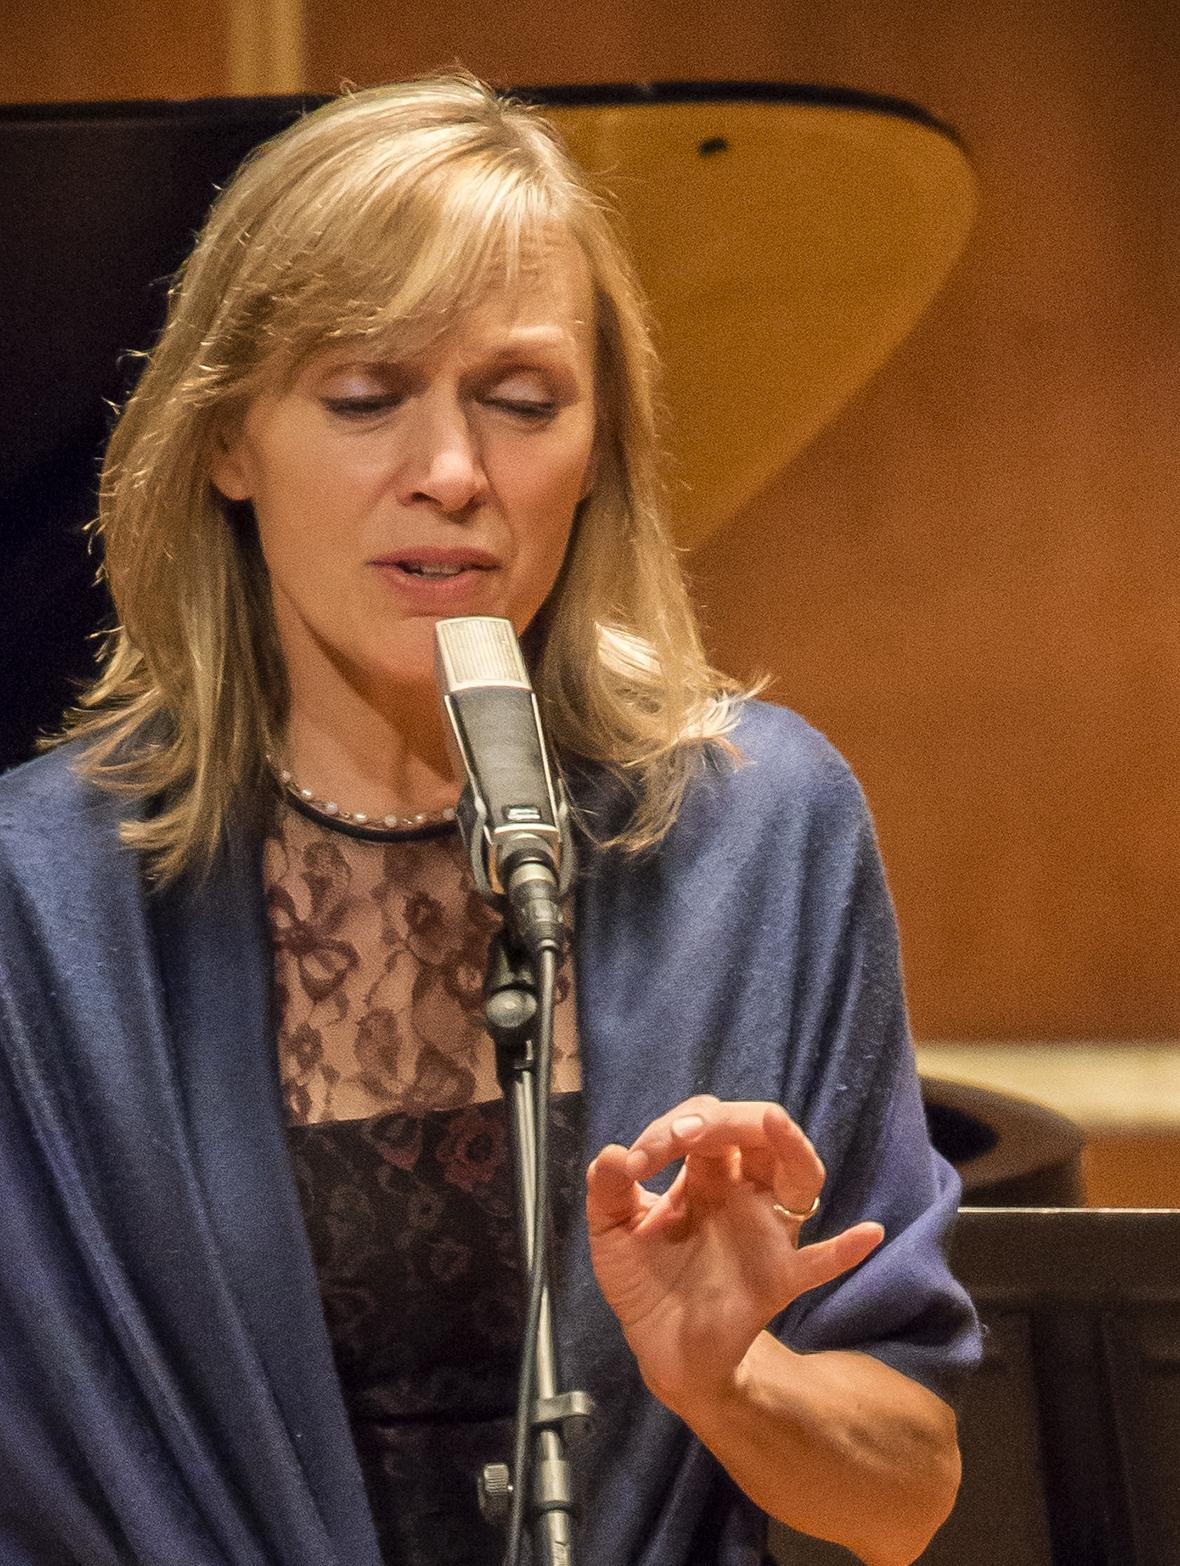 Vocalist Dominique Eade